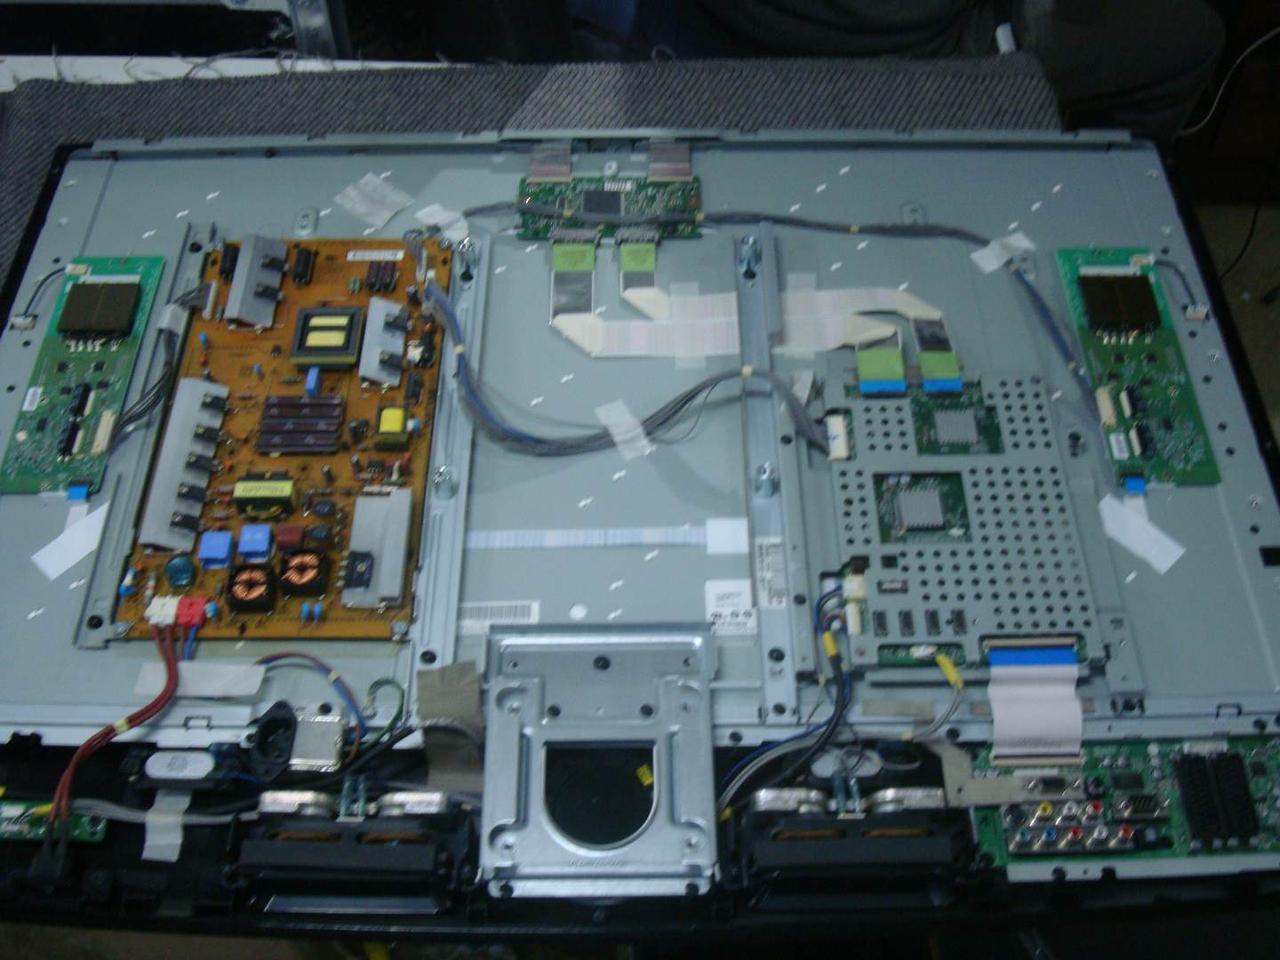 Запчасти к телевизору LG 37LH7000 (EAX55684502(1), EAY58476001, 6870C-0264B, 6632L-0539A, Eax58326902)